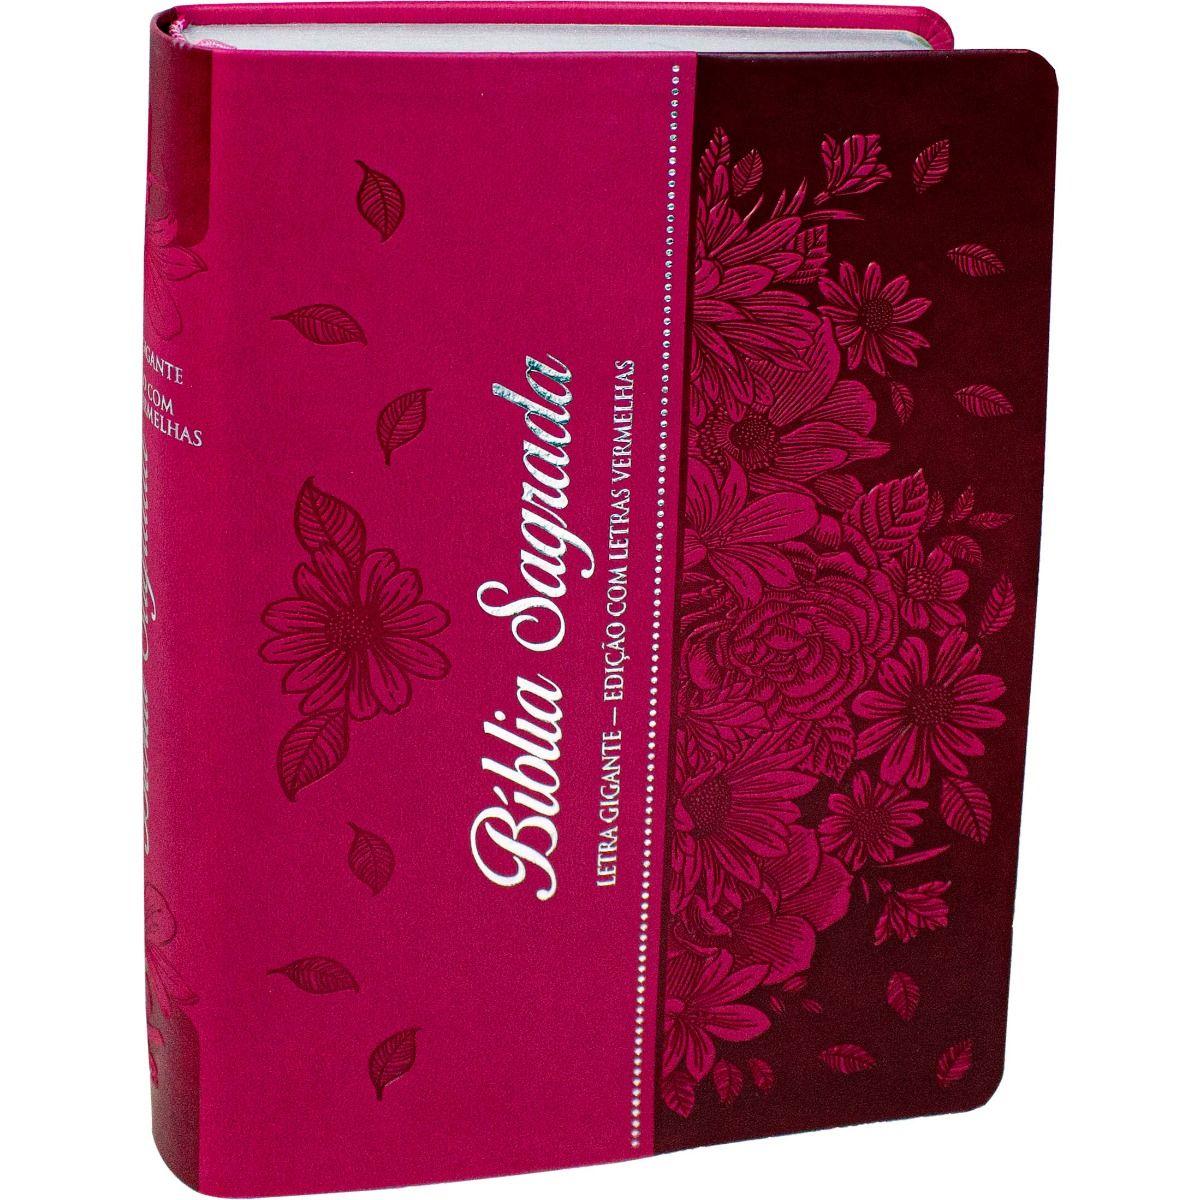 Bíblia Letra Gigante ARC Com Índice Pink Flor